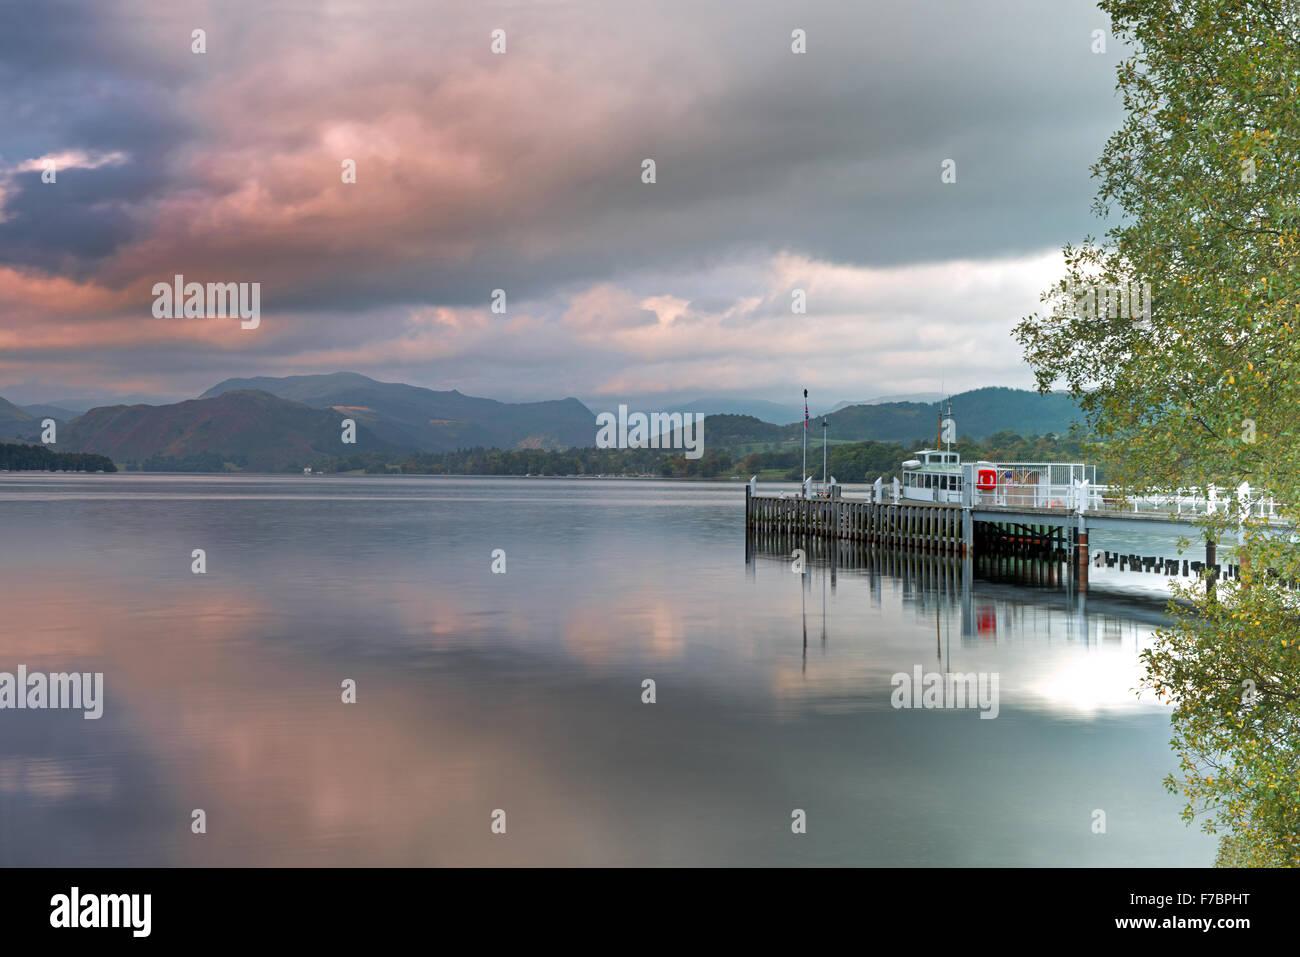 Steamer and Ferry Landing on Ullswater Lake, Pooley Bridge, Lake District National Park, Cumbria, England, Uk, Gb Stock Photo